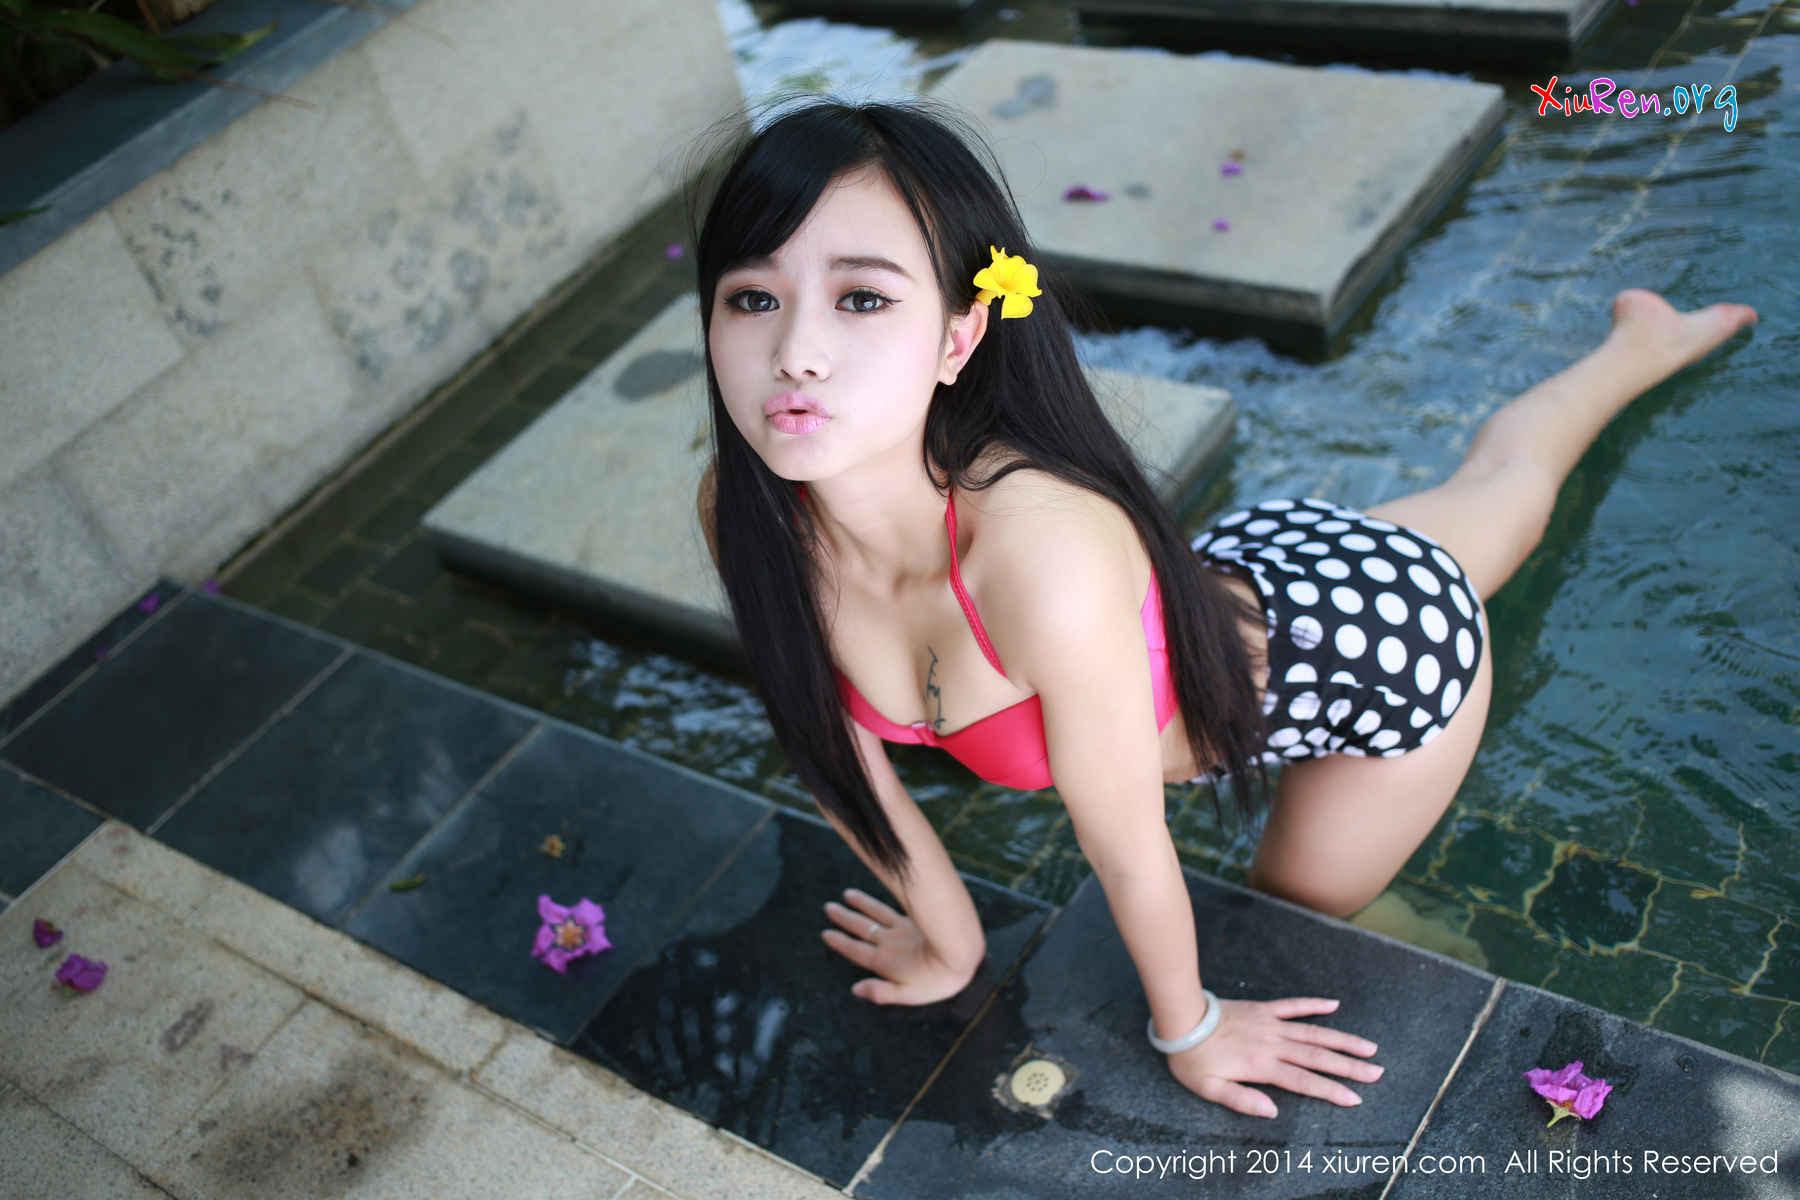 PhimVu-Blog-0046.jpg